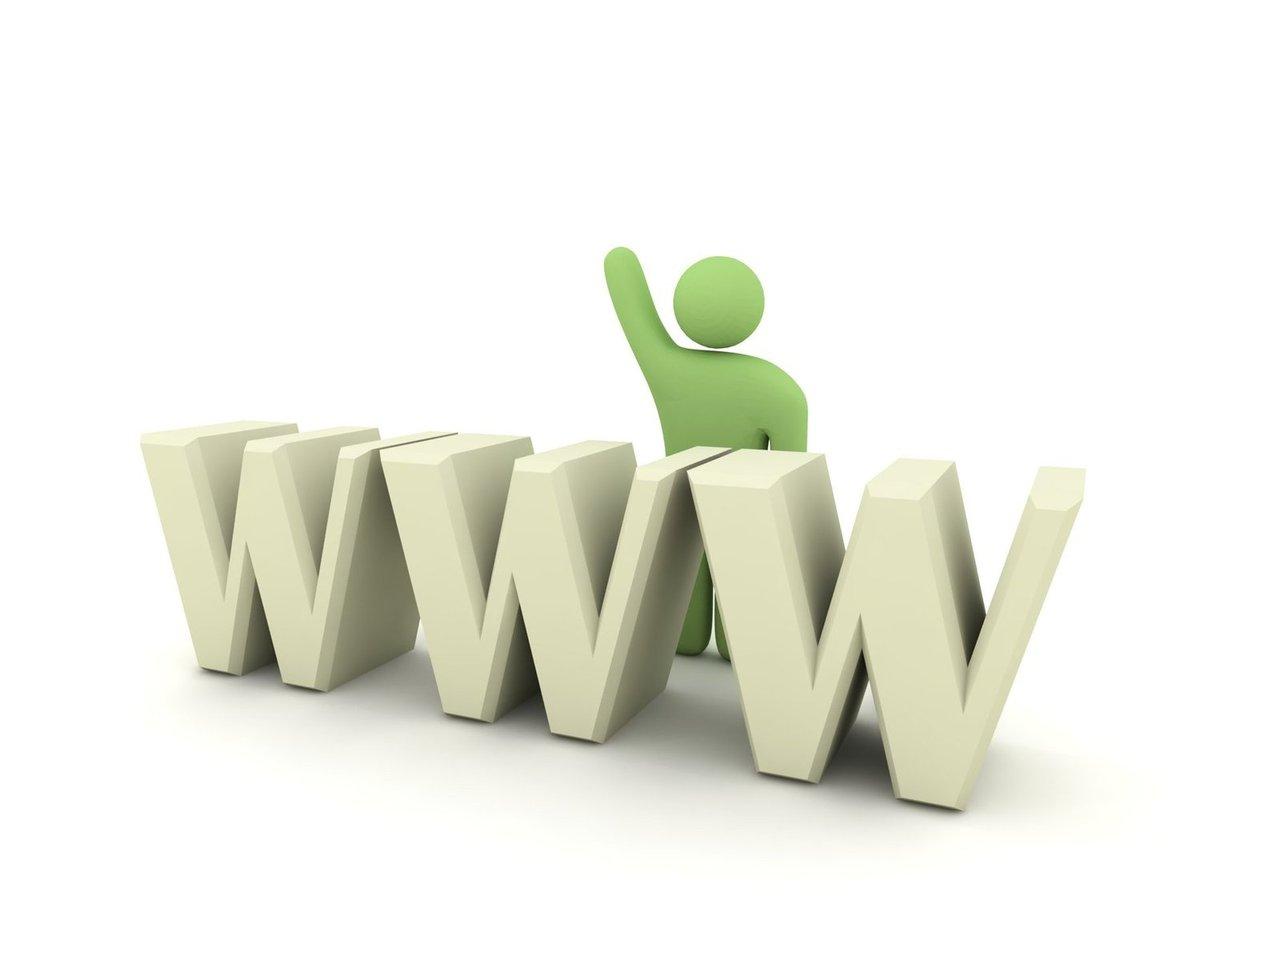 O co musi dbać dostawca hostingu?